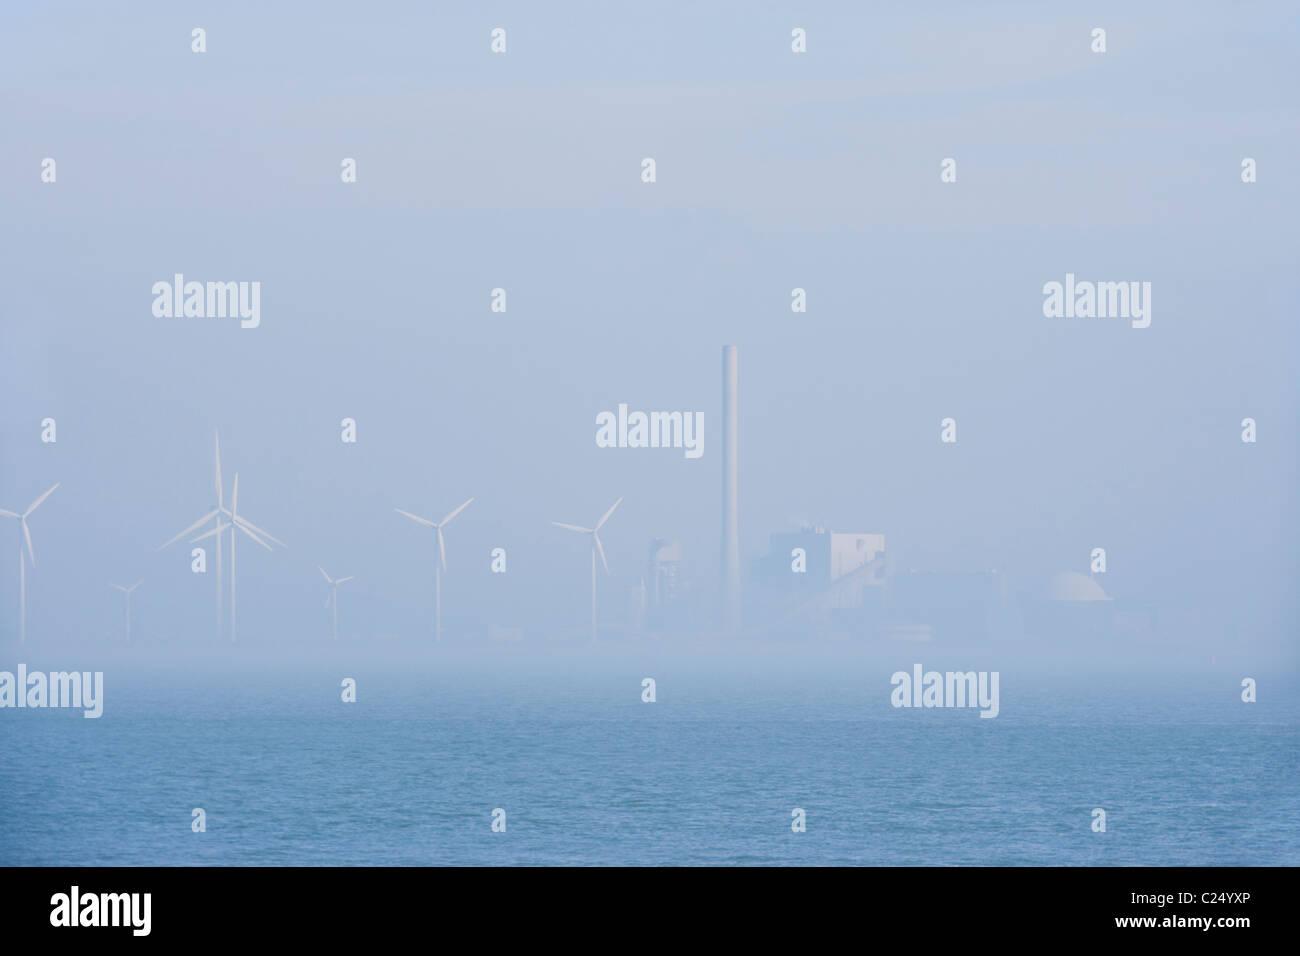 Kernkraftwerk Borssele, Pflanze, Ufer der Westerschelde, Westerschelde, RIA. Niederlande Holland Niederländisch. Stockbild